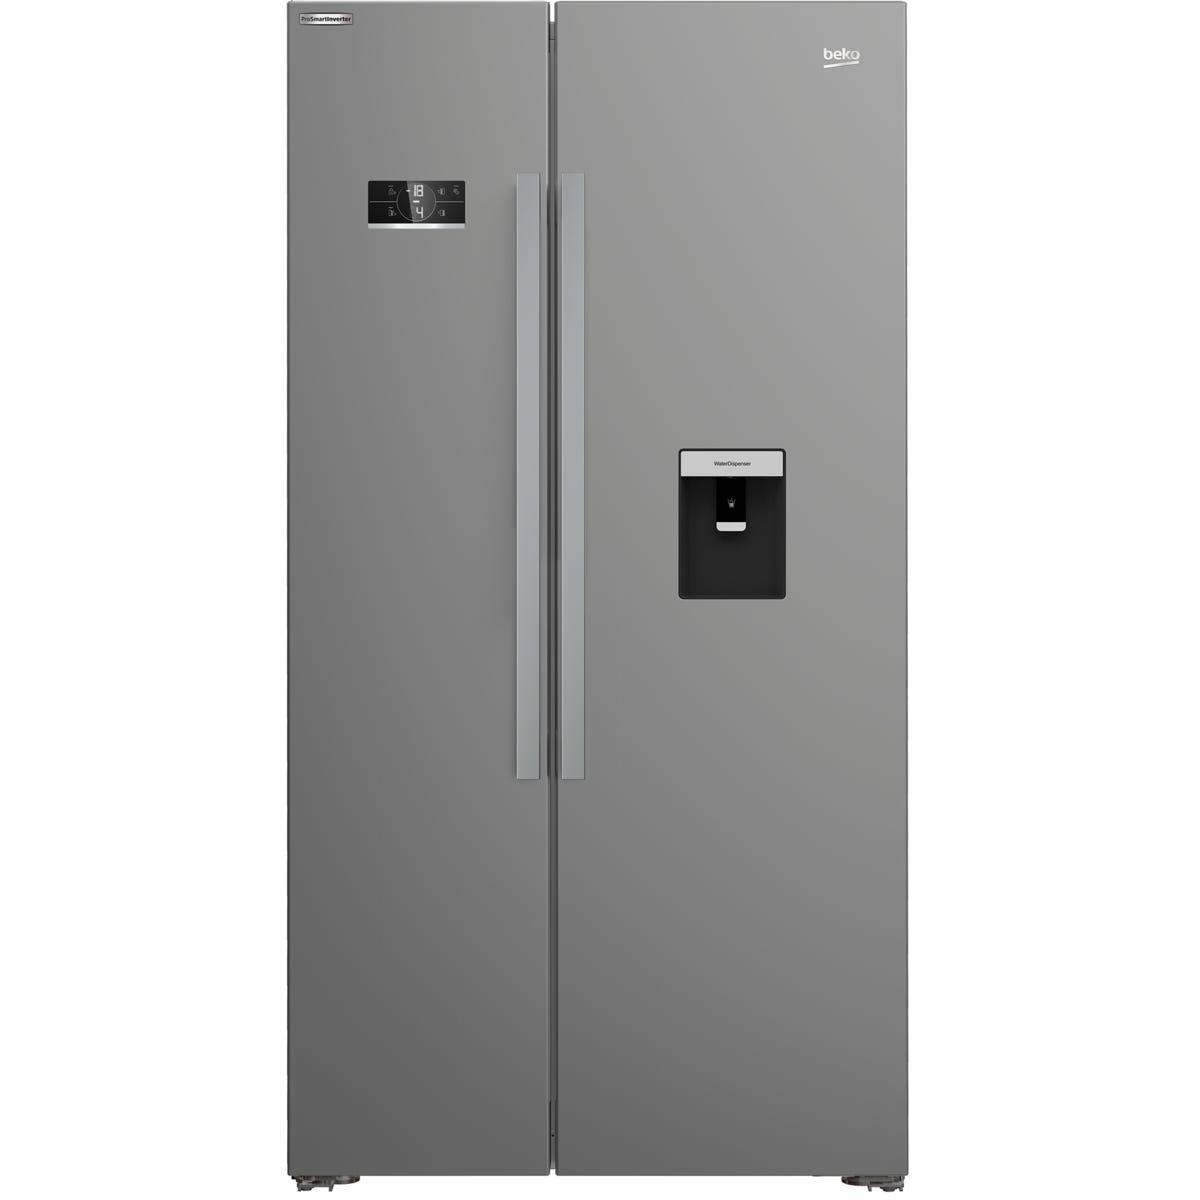 Beko ASD2341VX American Style Frost Free 368L/190L Fridge Freezer - Stainless Steel